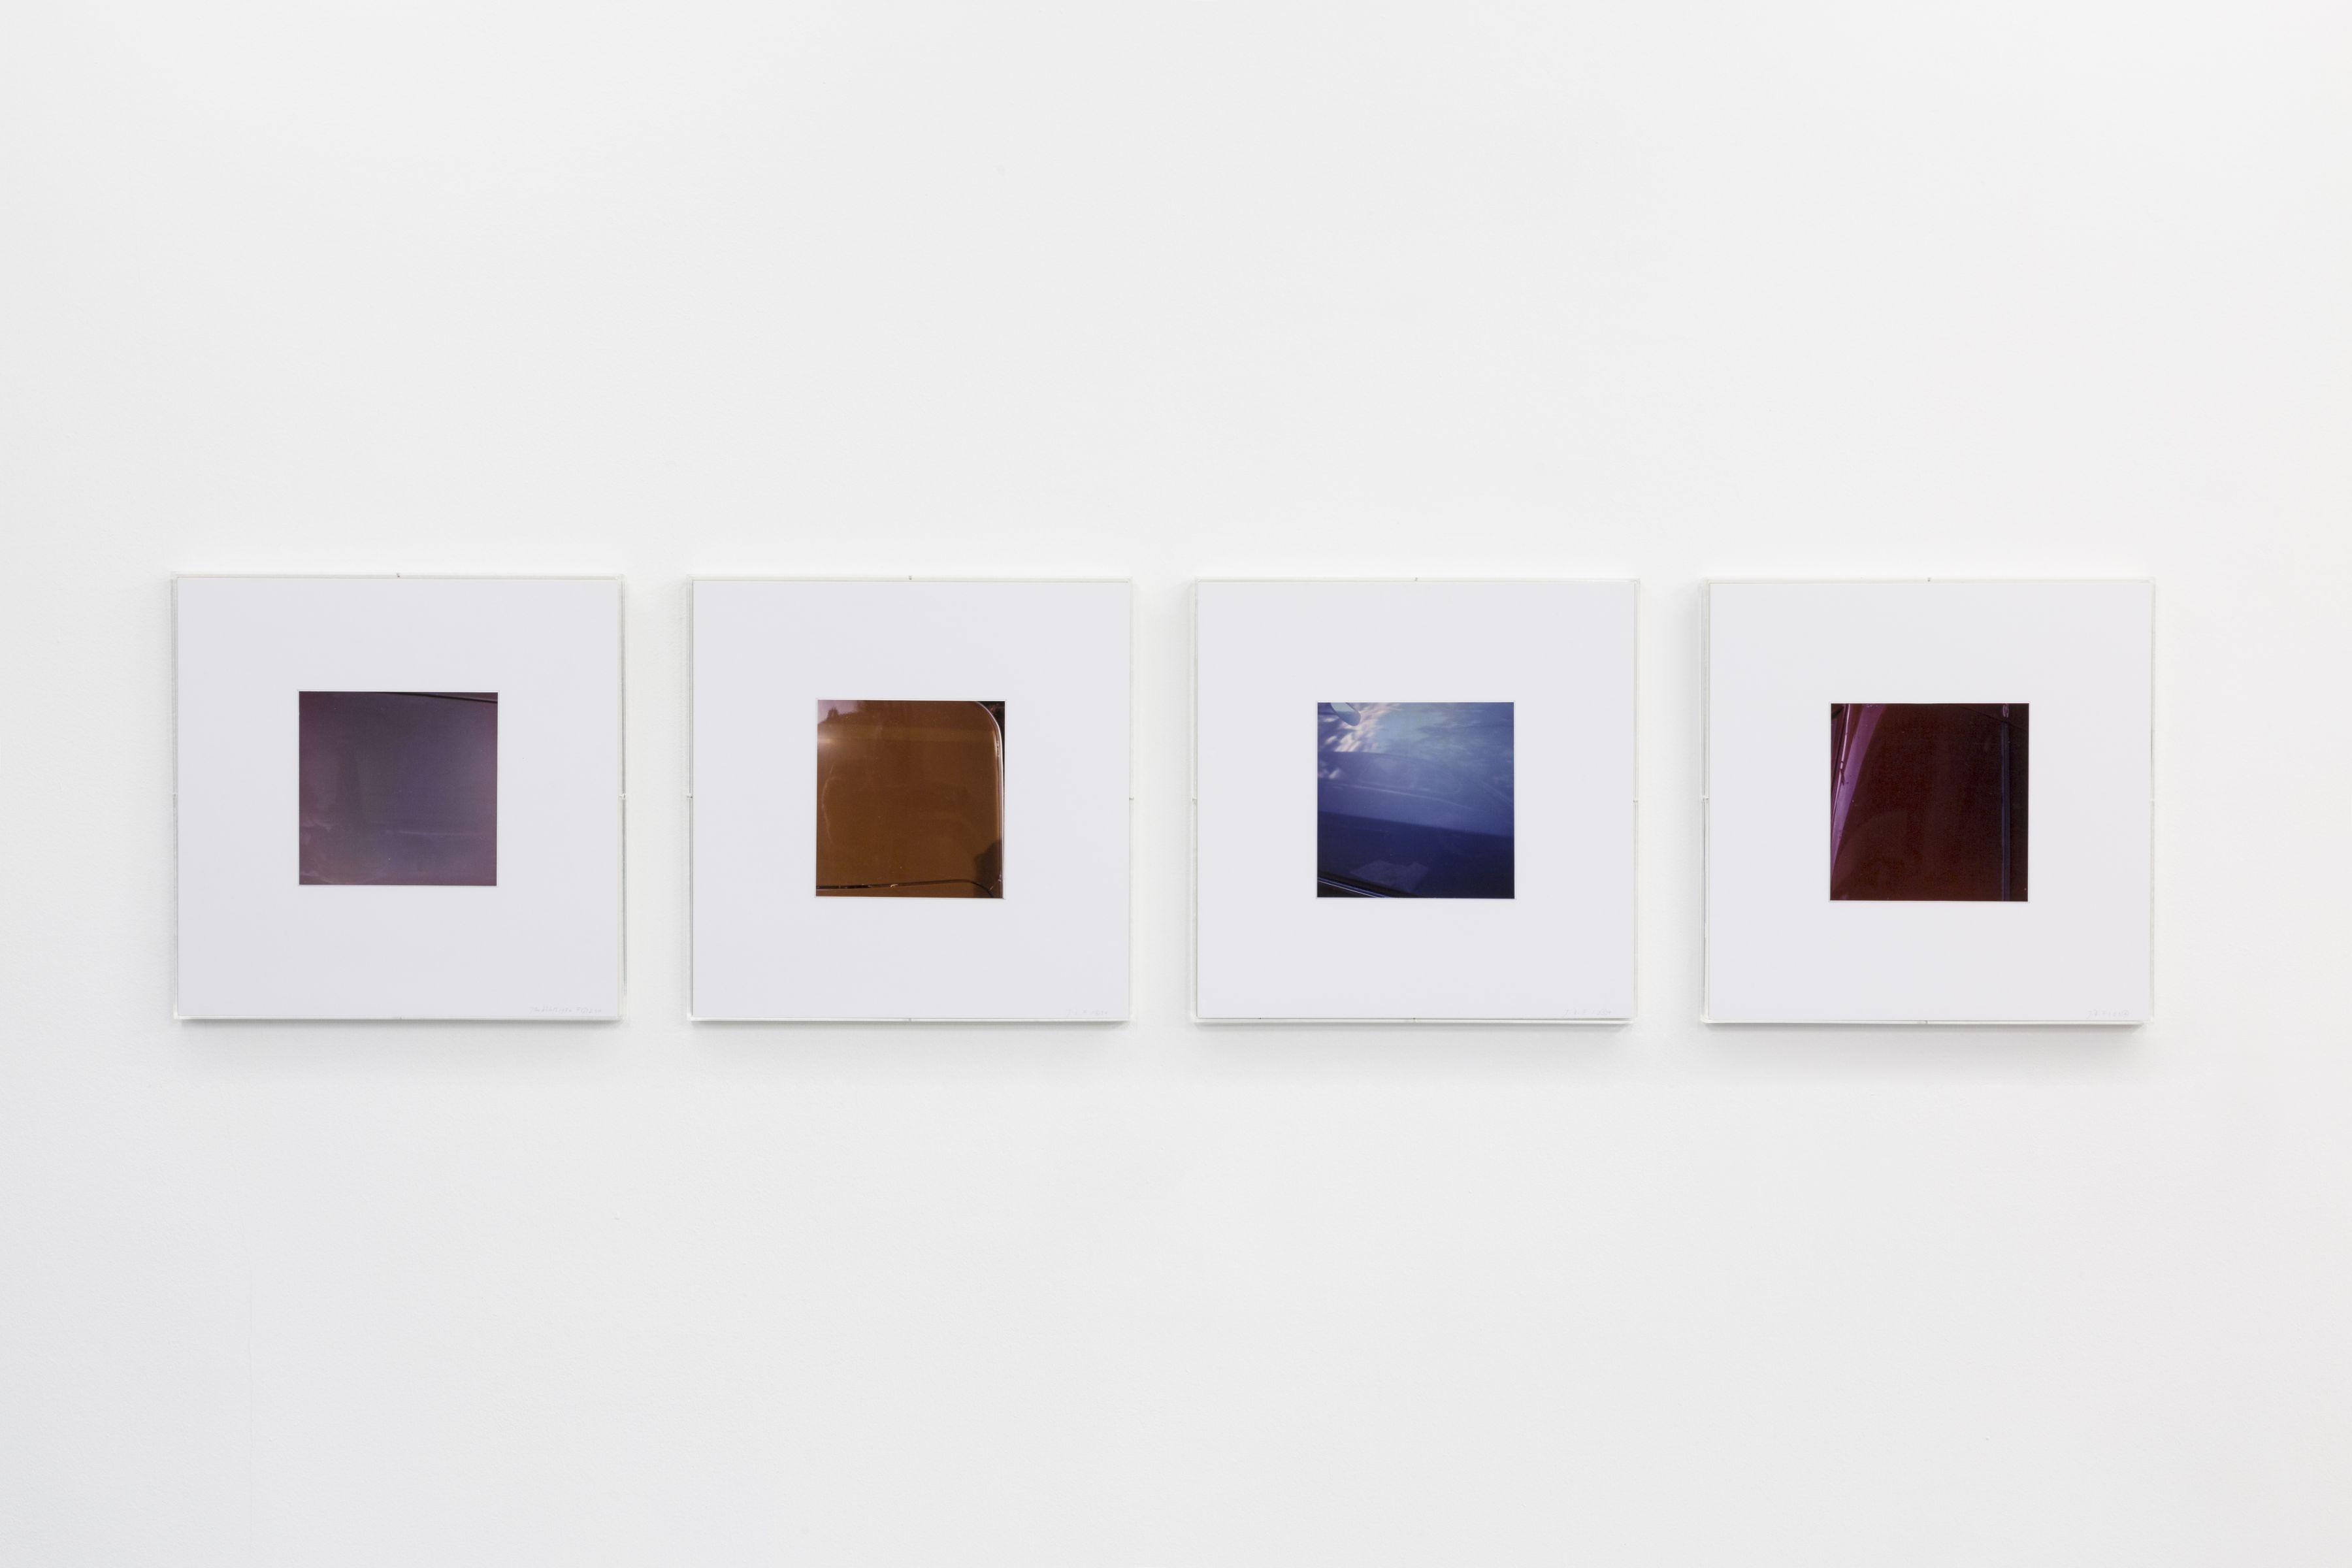 Jan Dibbets: New Colorstudies 1976/2012 – installation view 8